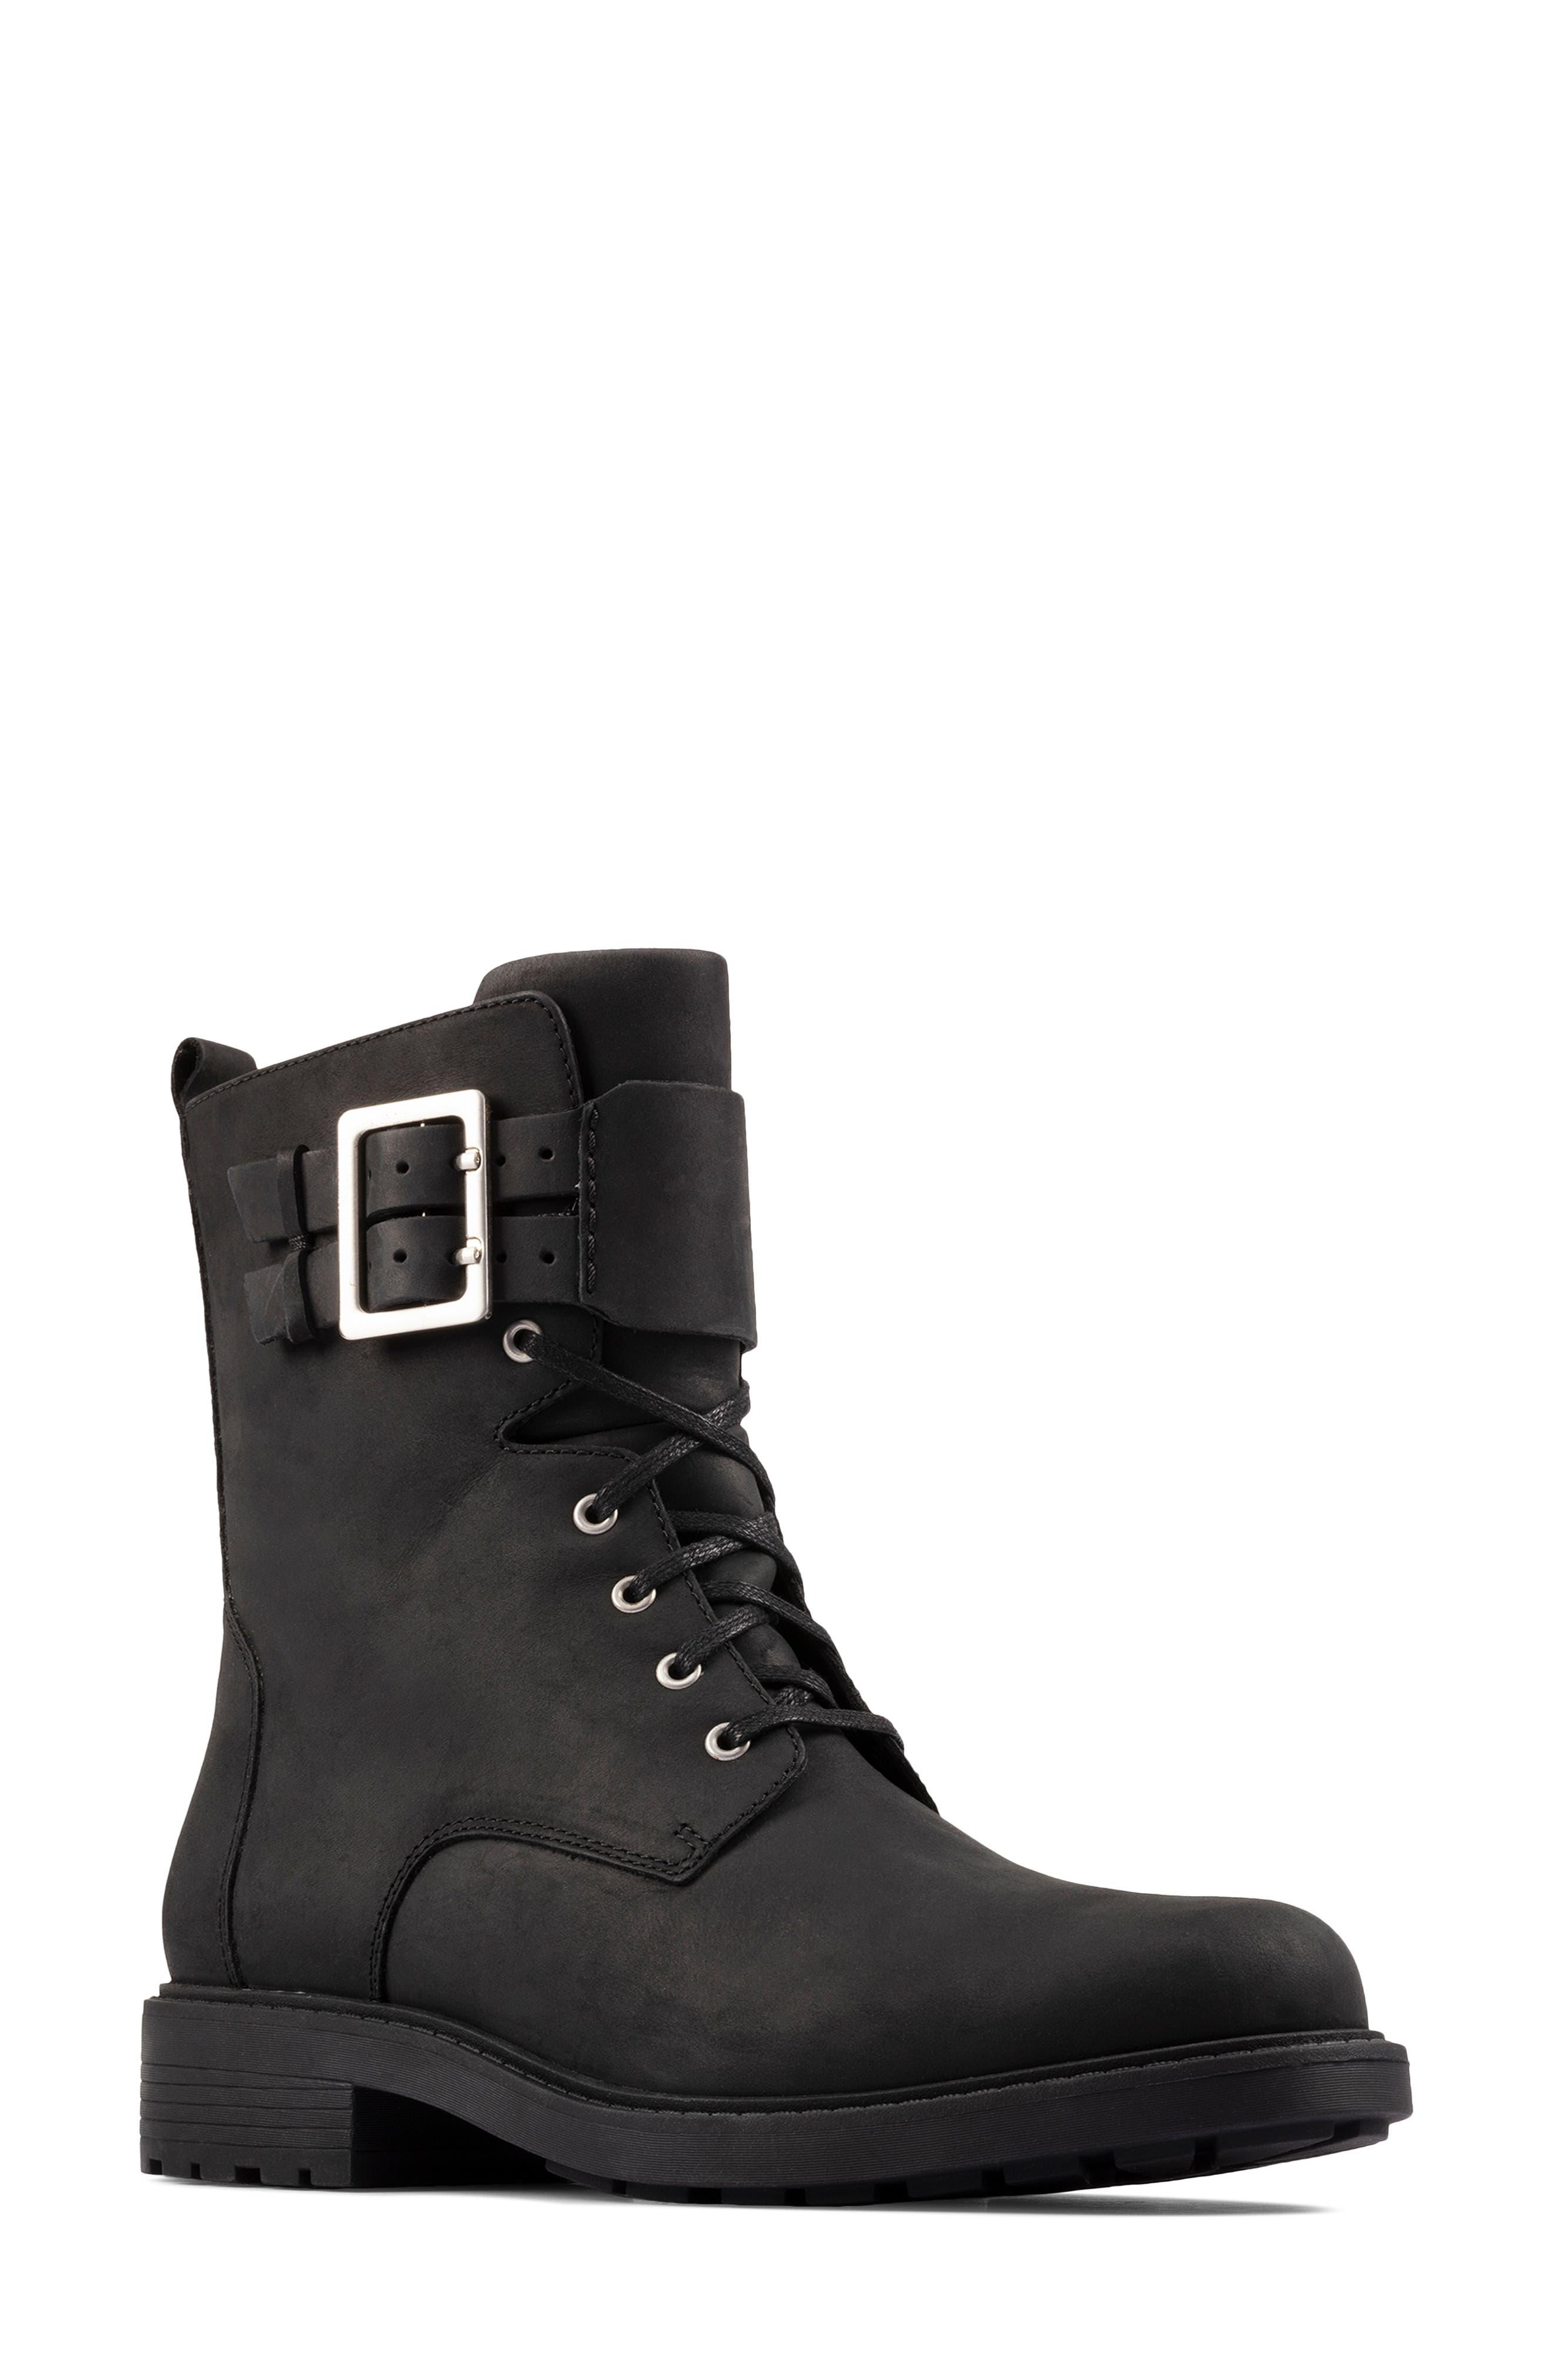 Women's Clarks Orinoco 2 Combat Boot